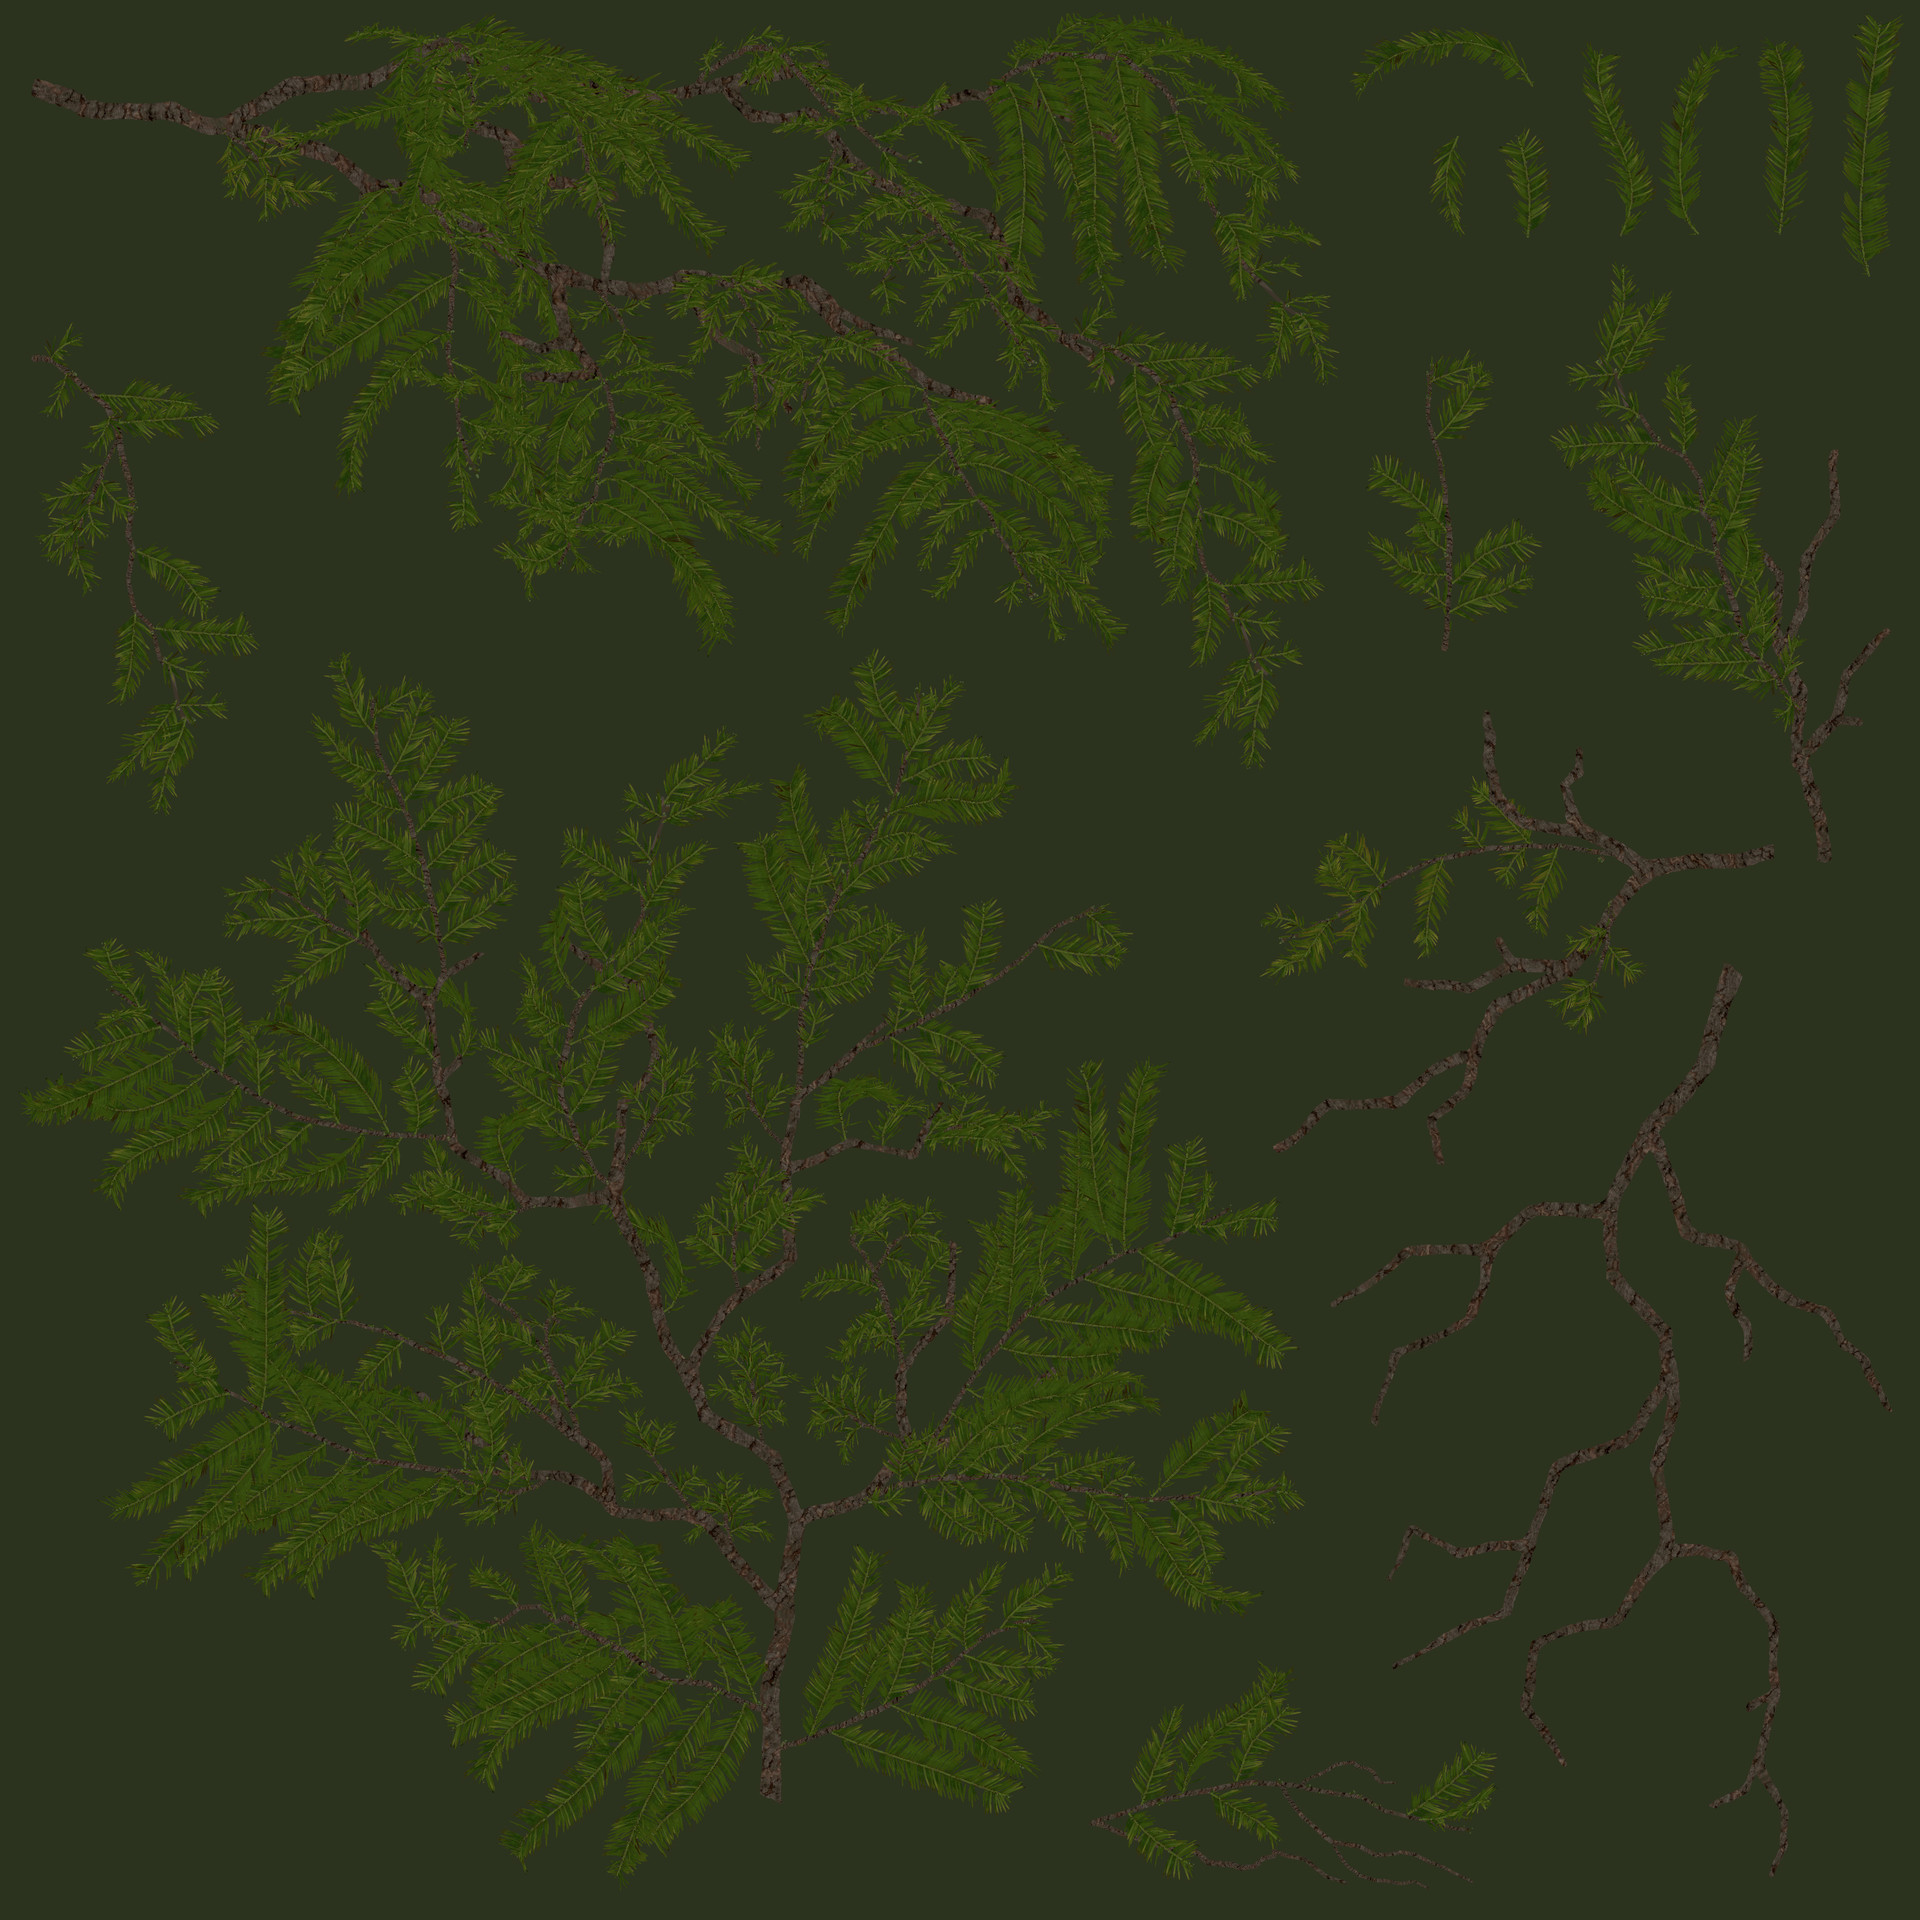 Agnieszka nogalska branches albedo